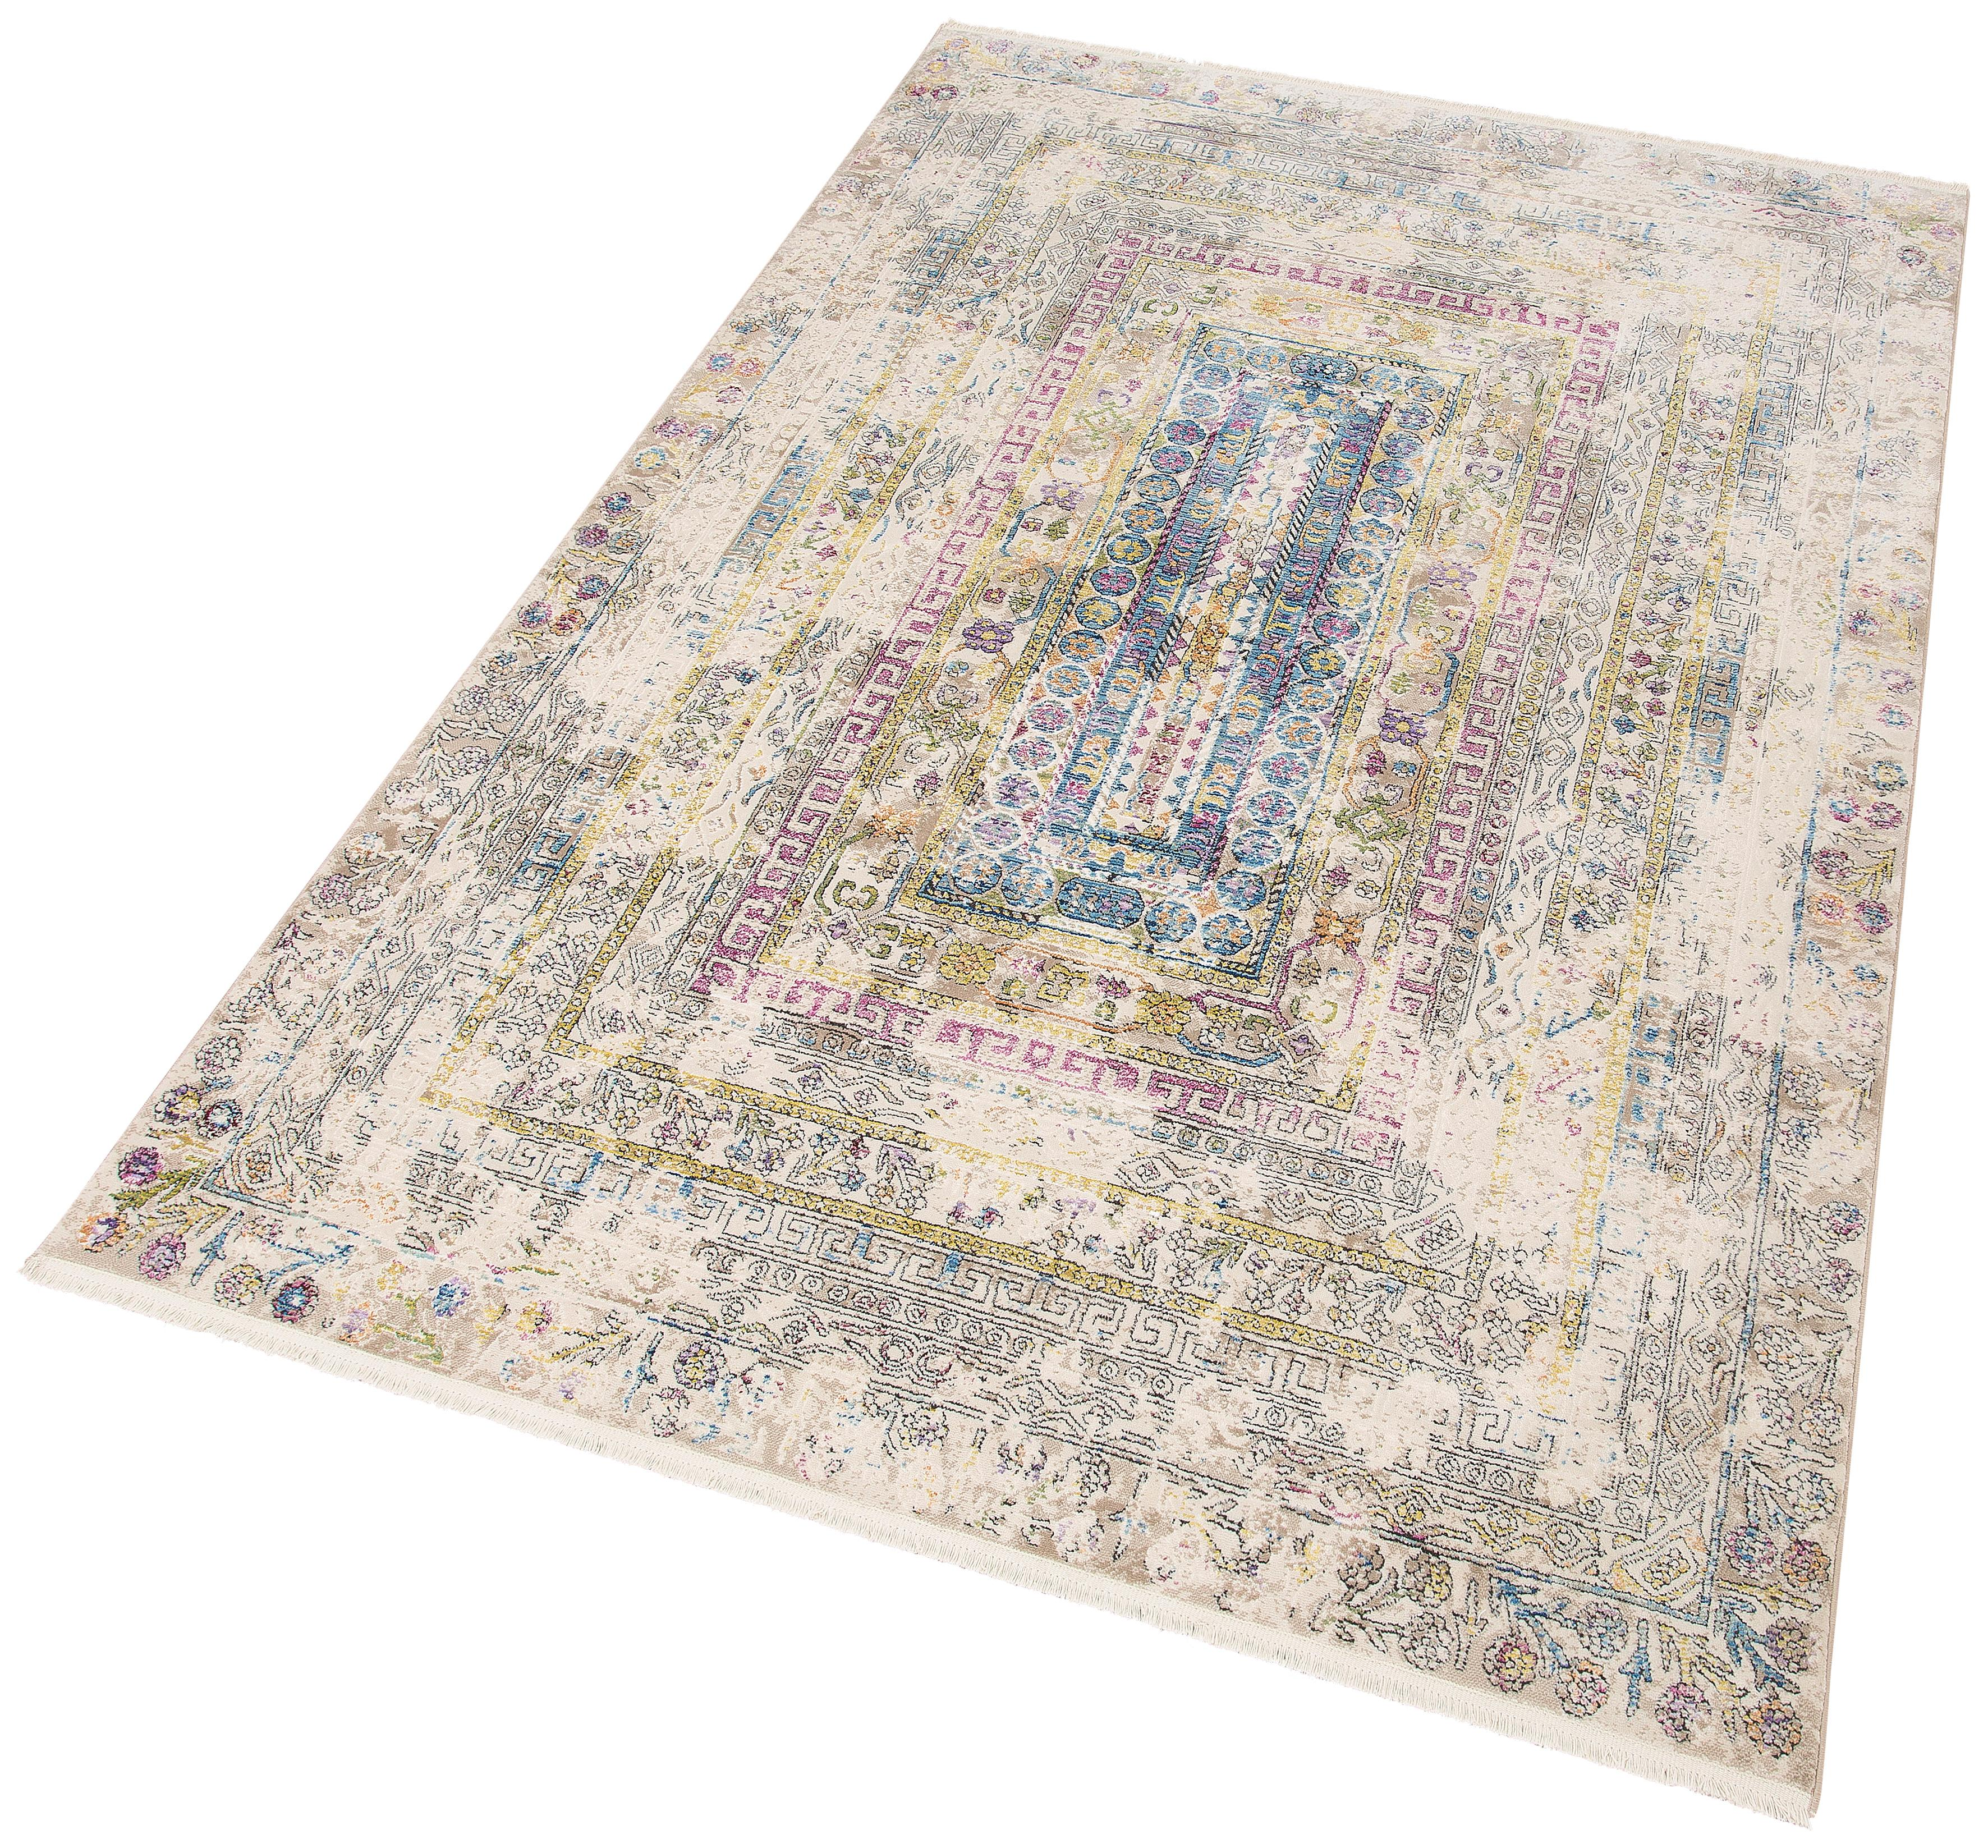 Teppich Colorful 24022 merinos rechteckig Höhe 7 mm maschinell gewebt